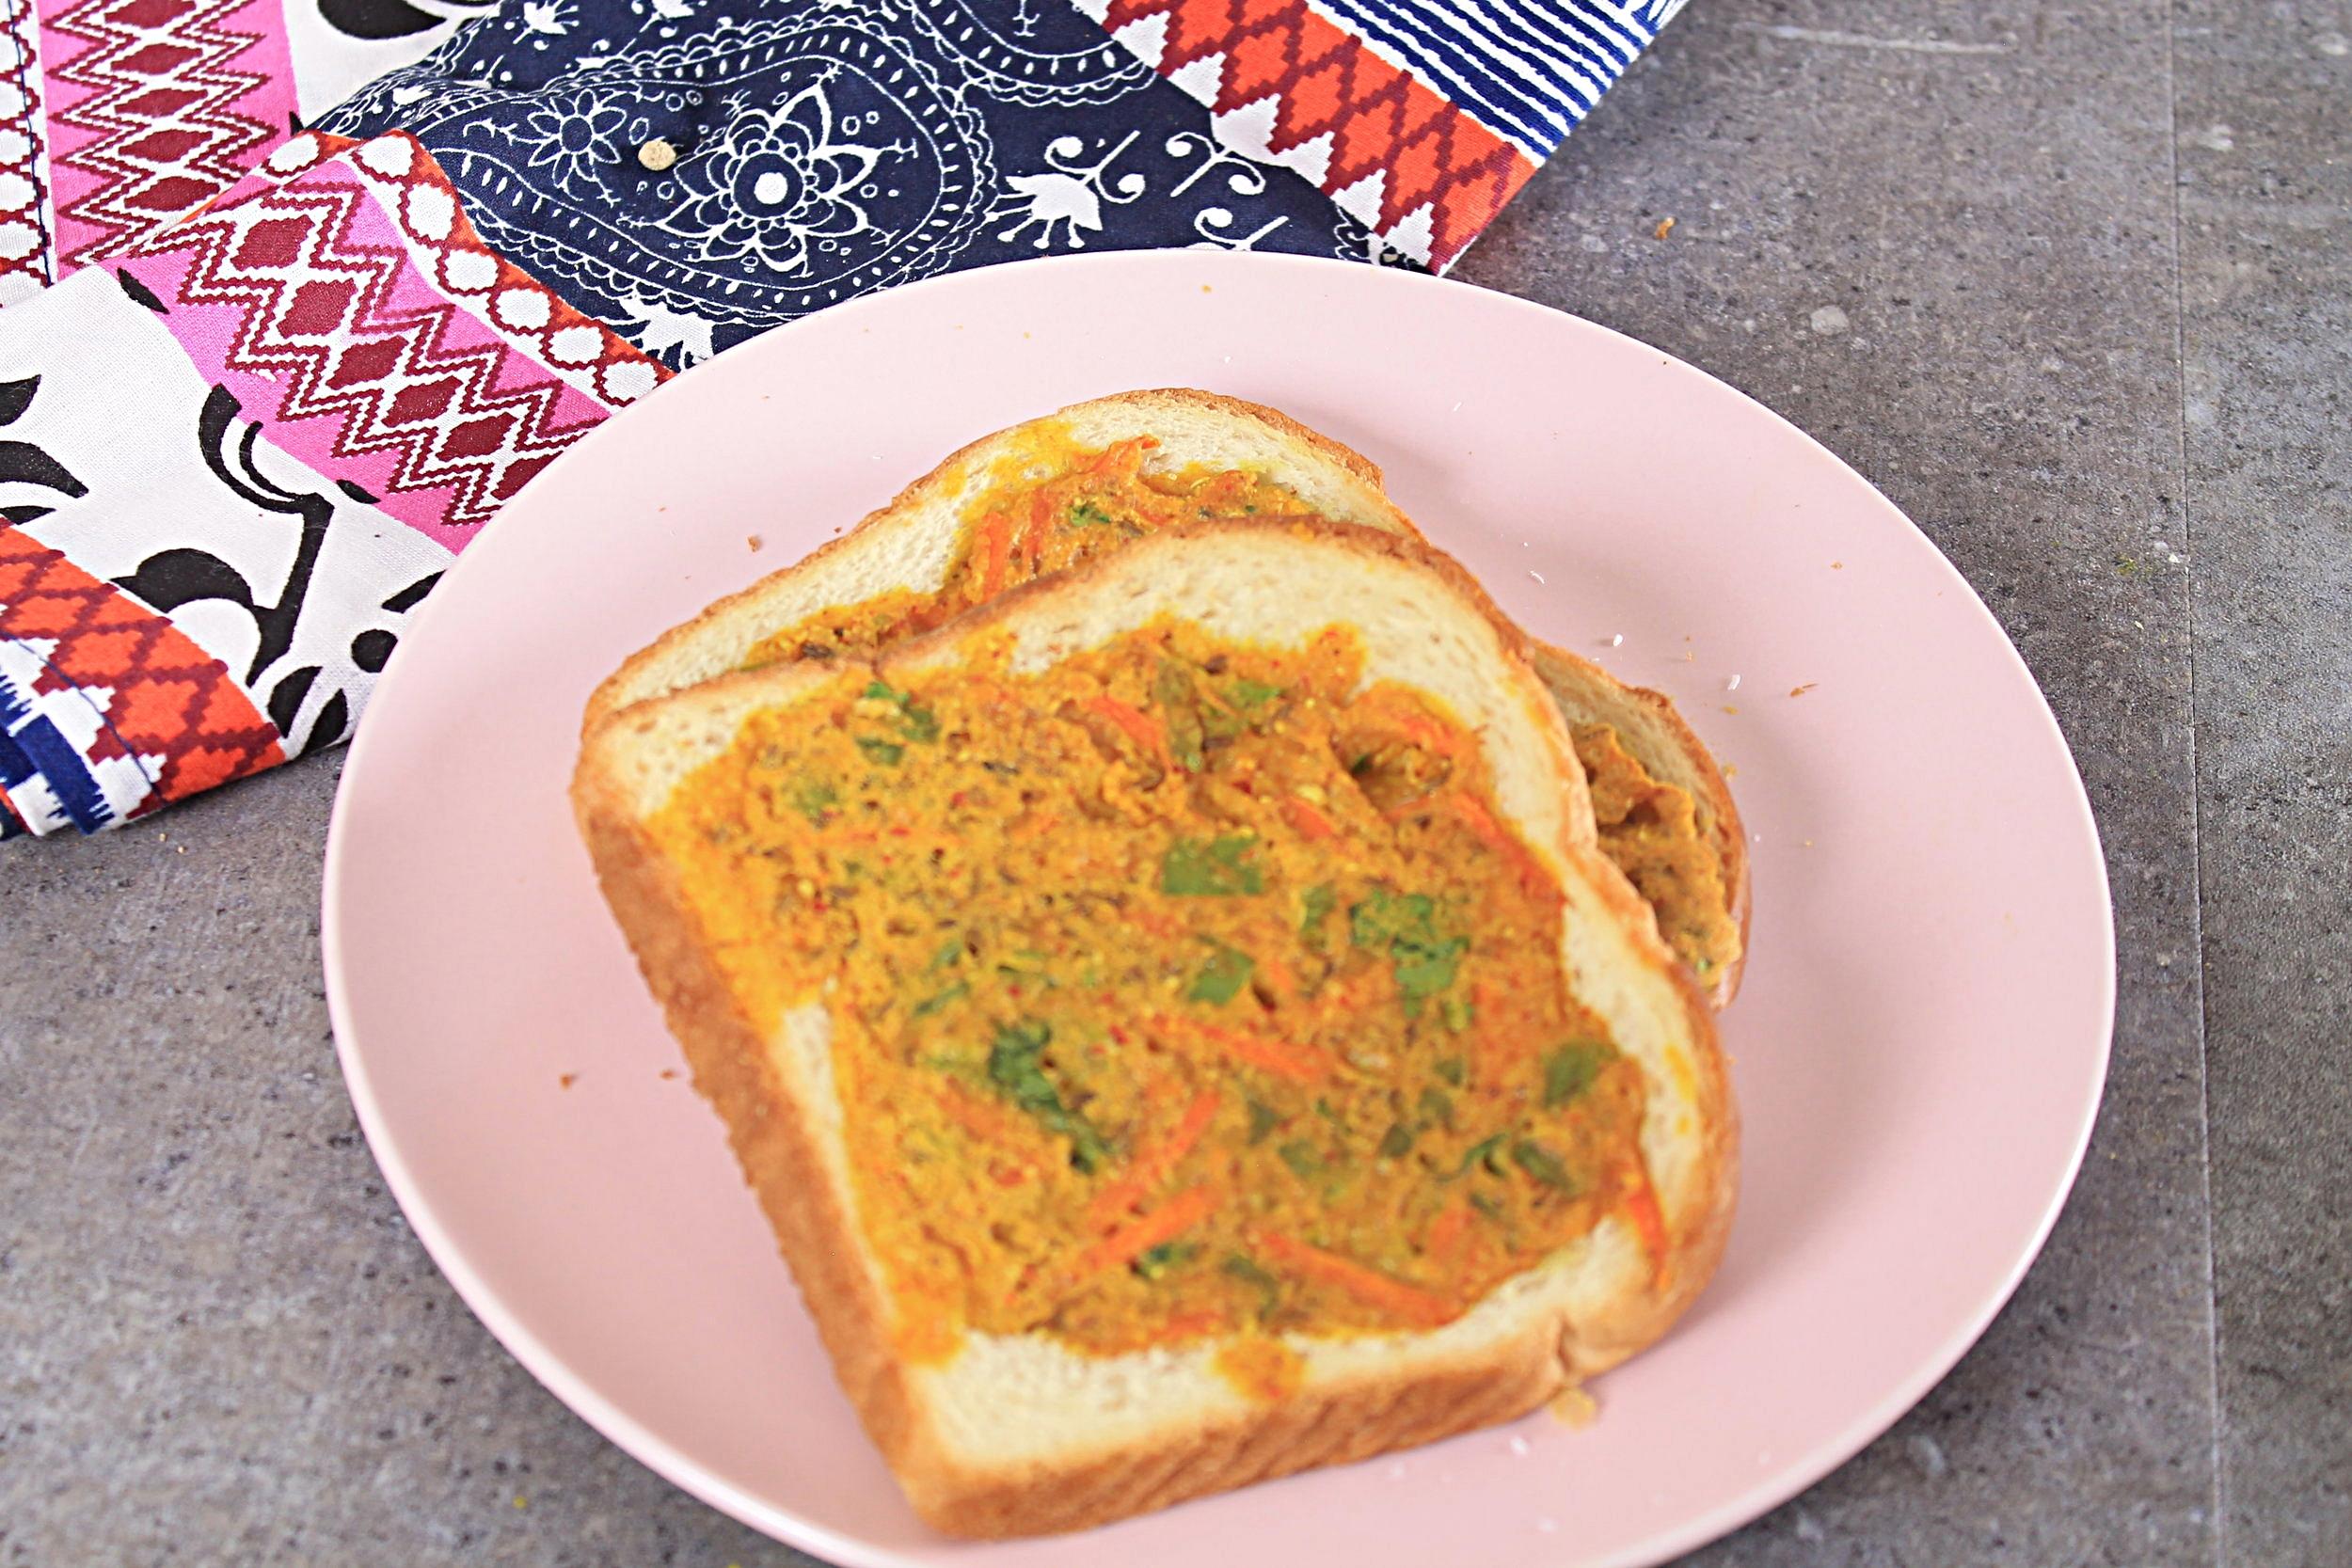 Eggless omelette toast - Savory